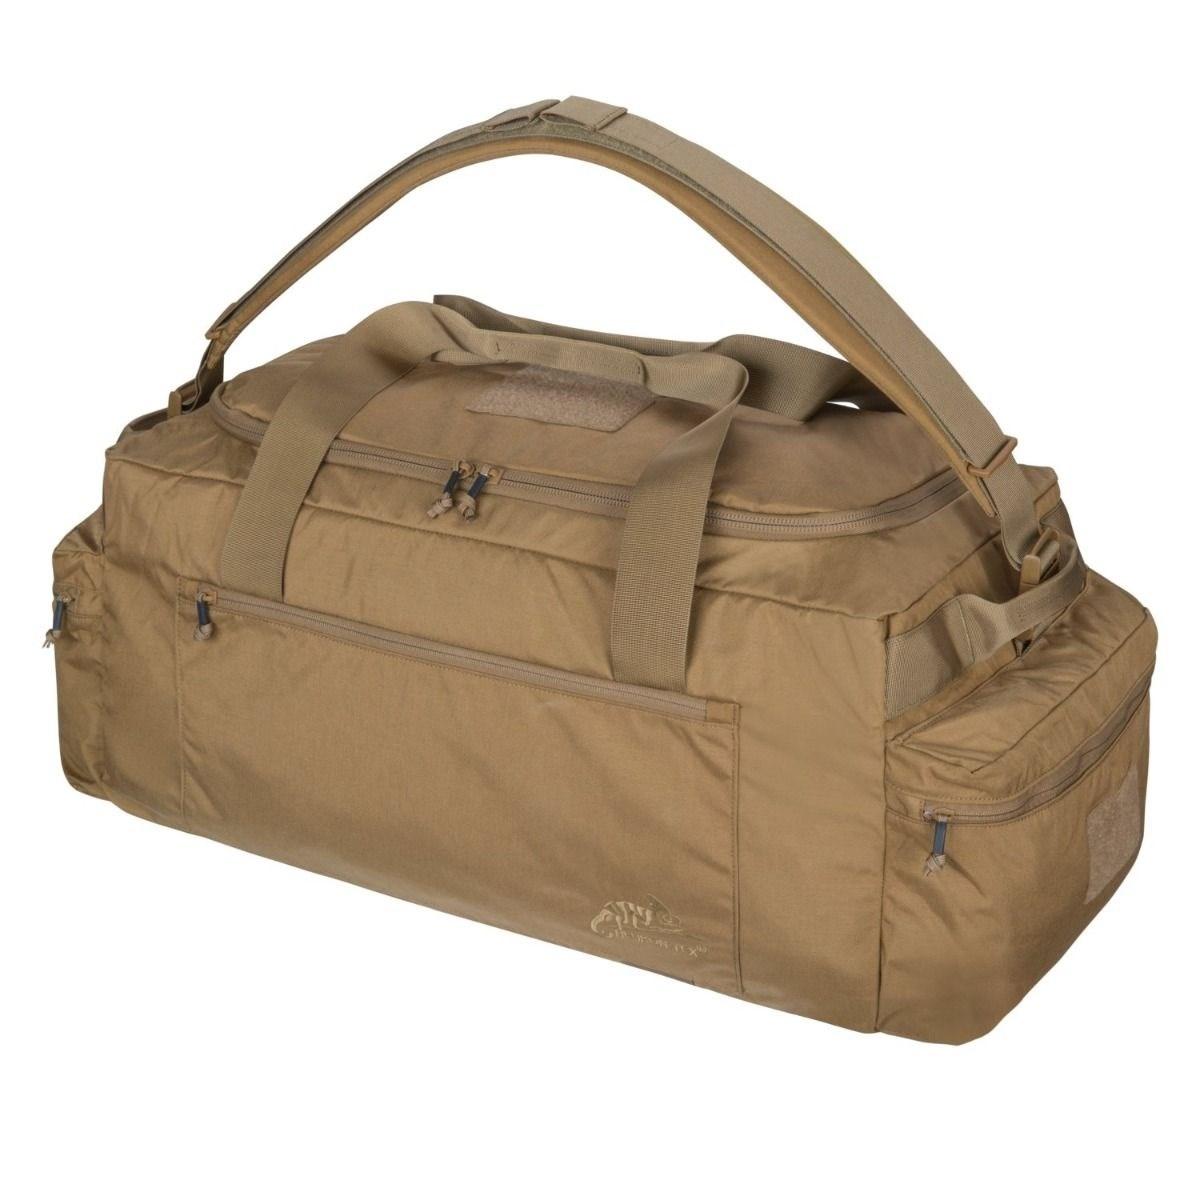 Taška URBAN TRAINING BAG® velká COYOTE